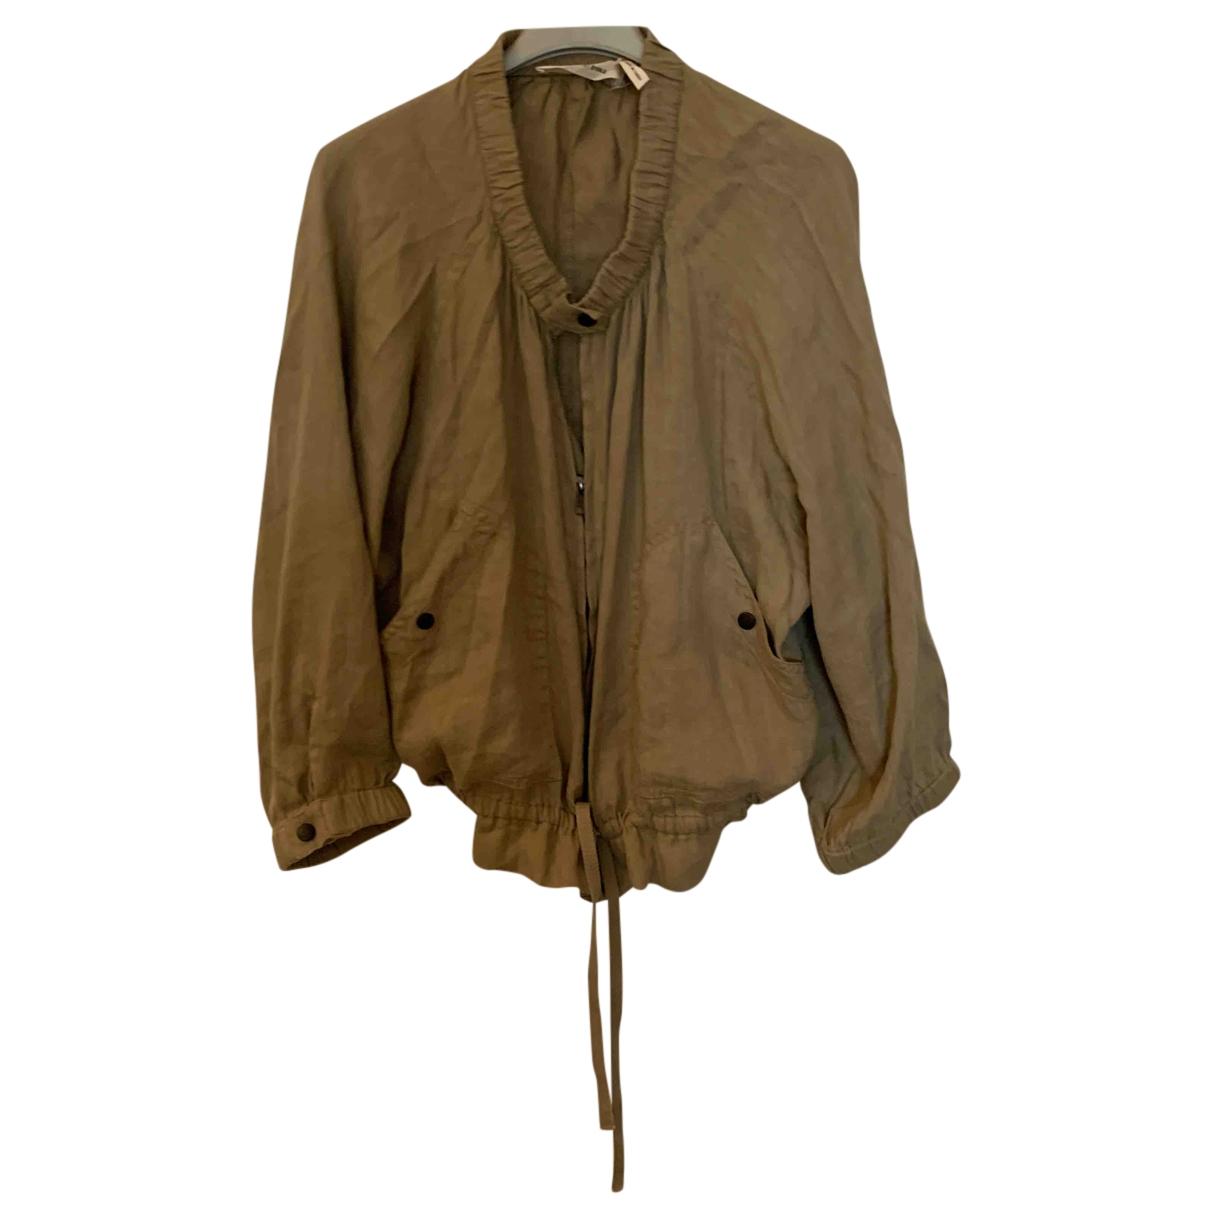 Isabel Marant Etoile \N Beige Linen jacket for Women 40 FR